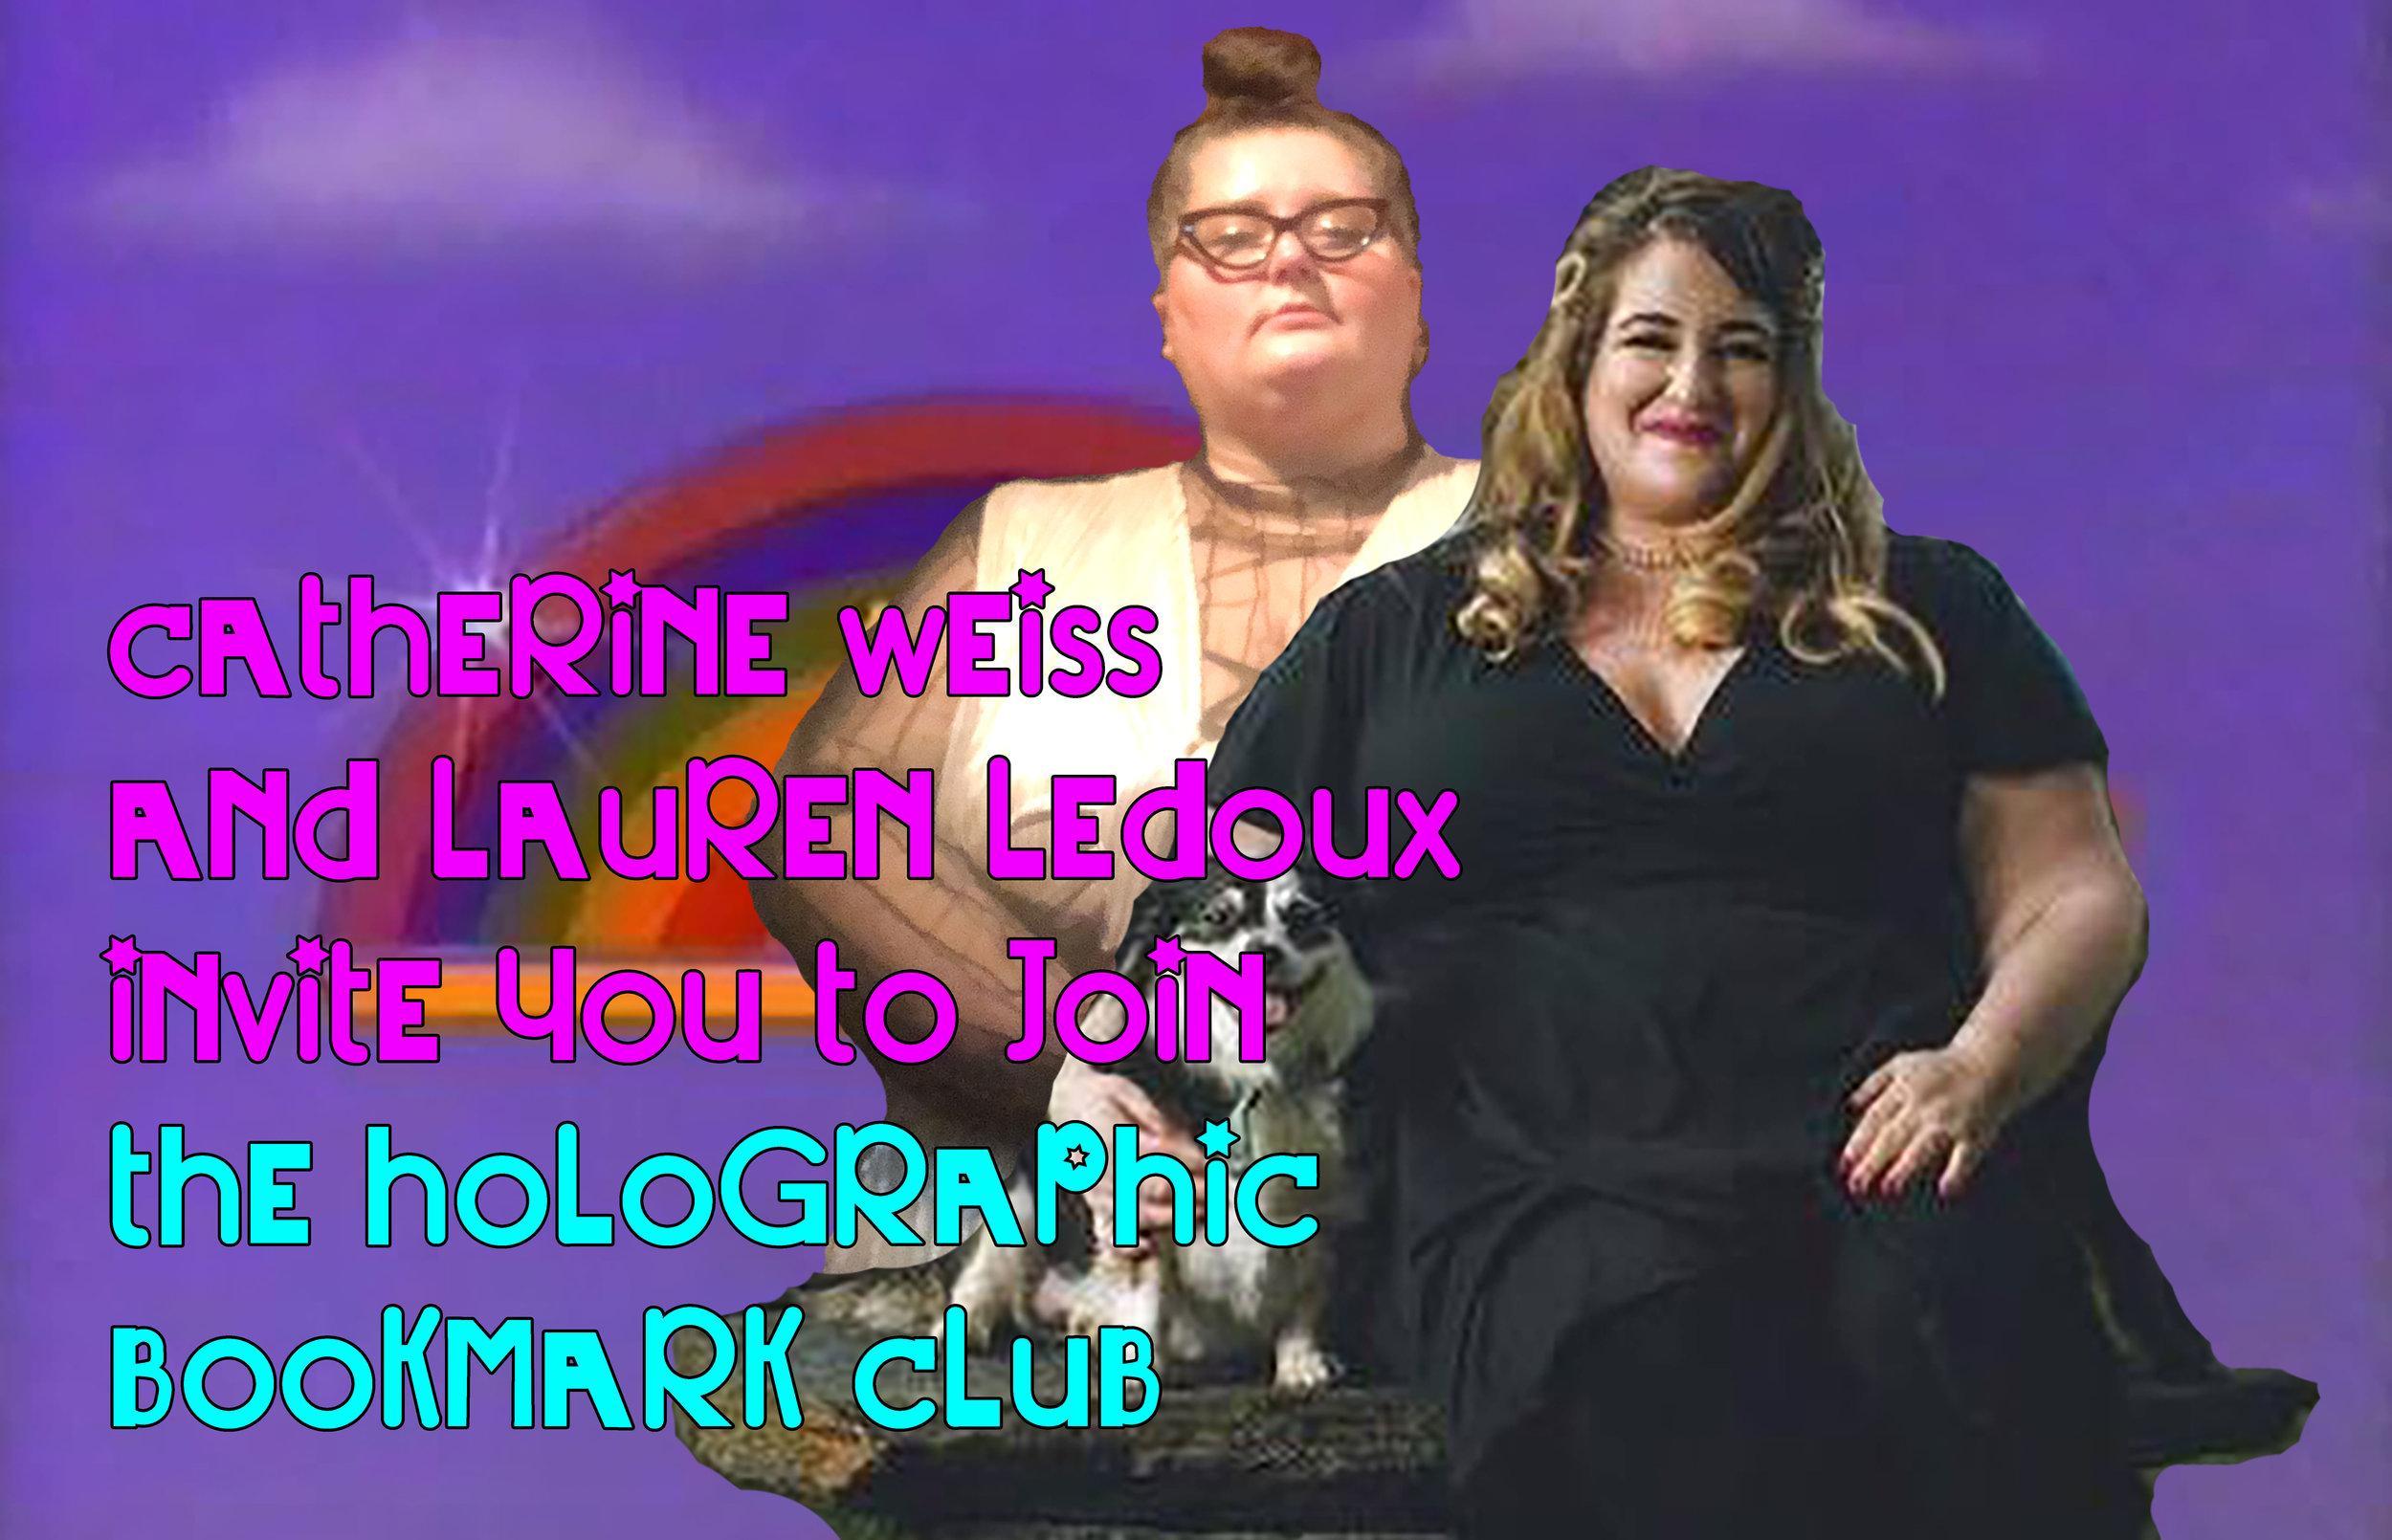 holographic-bookmark-club.jpg